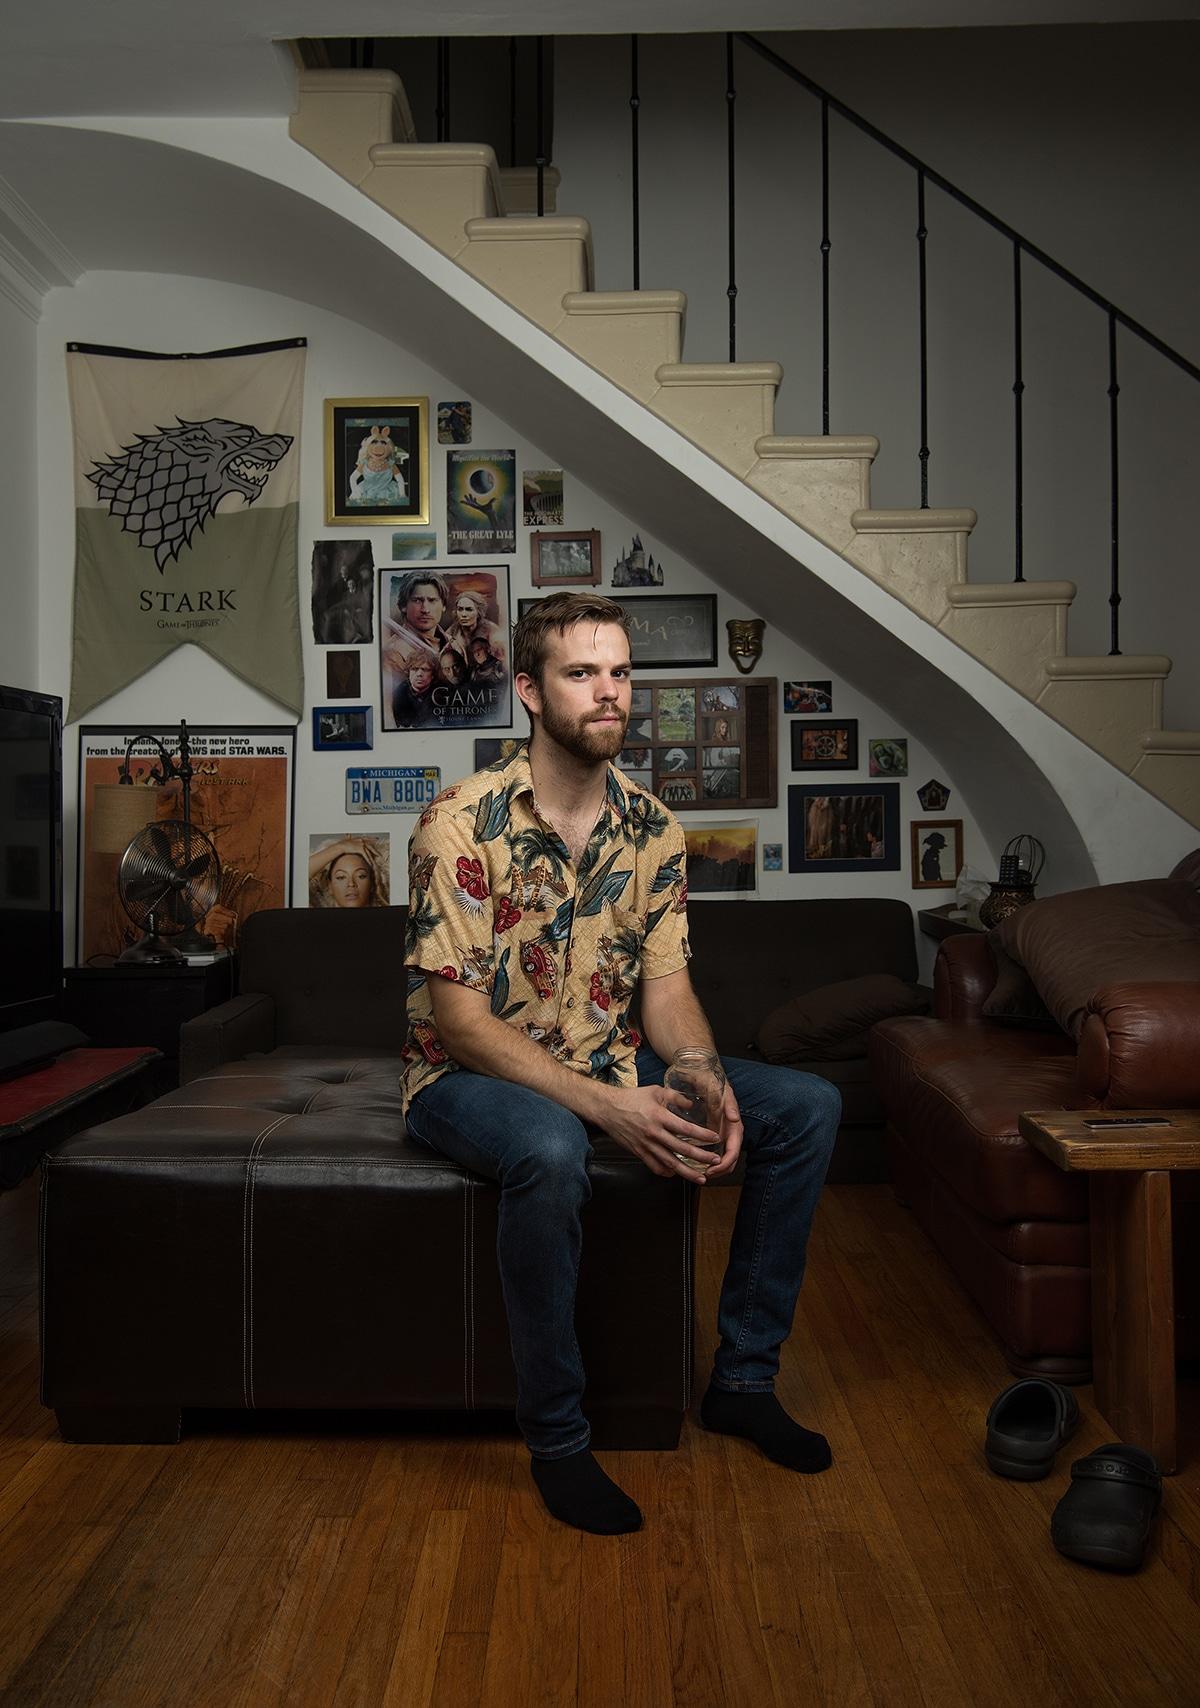 Craigslist Encounters Photo Series KremerJohnson